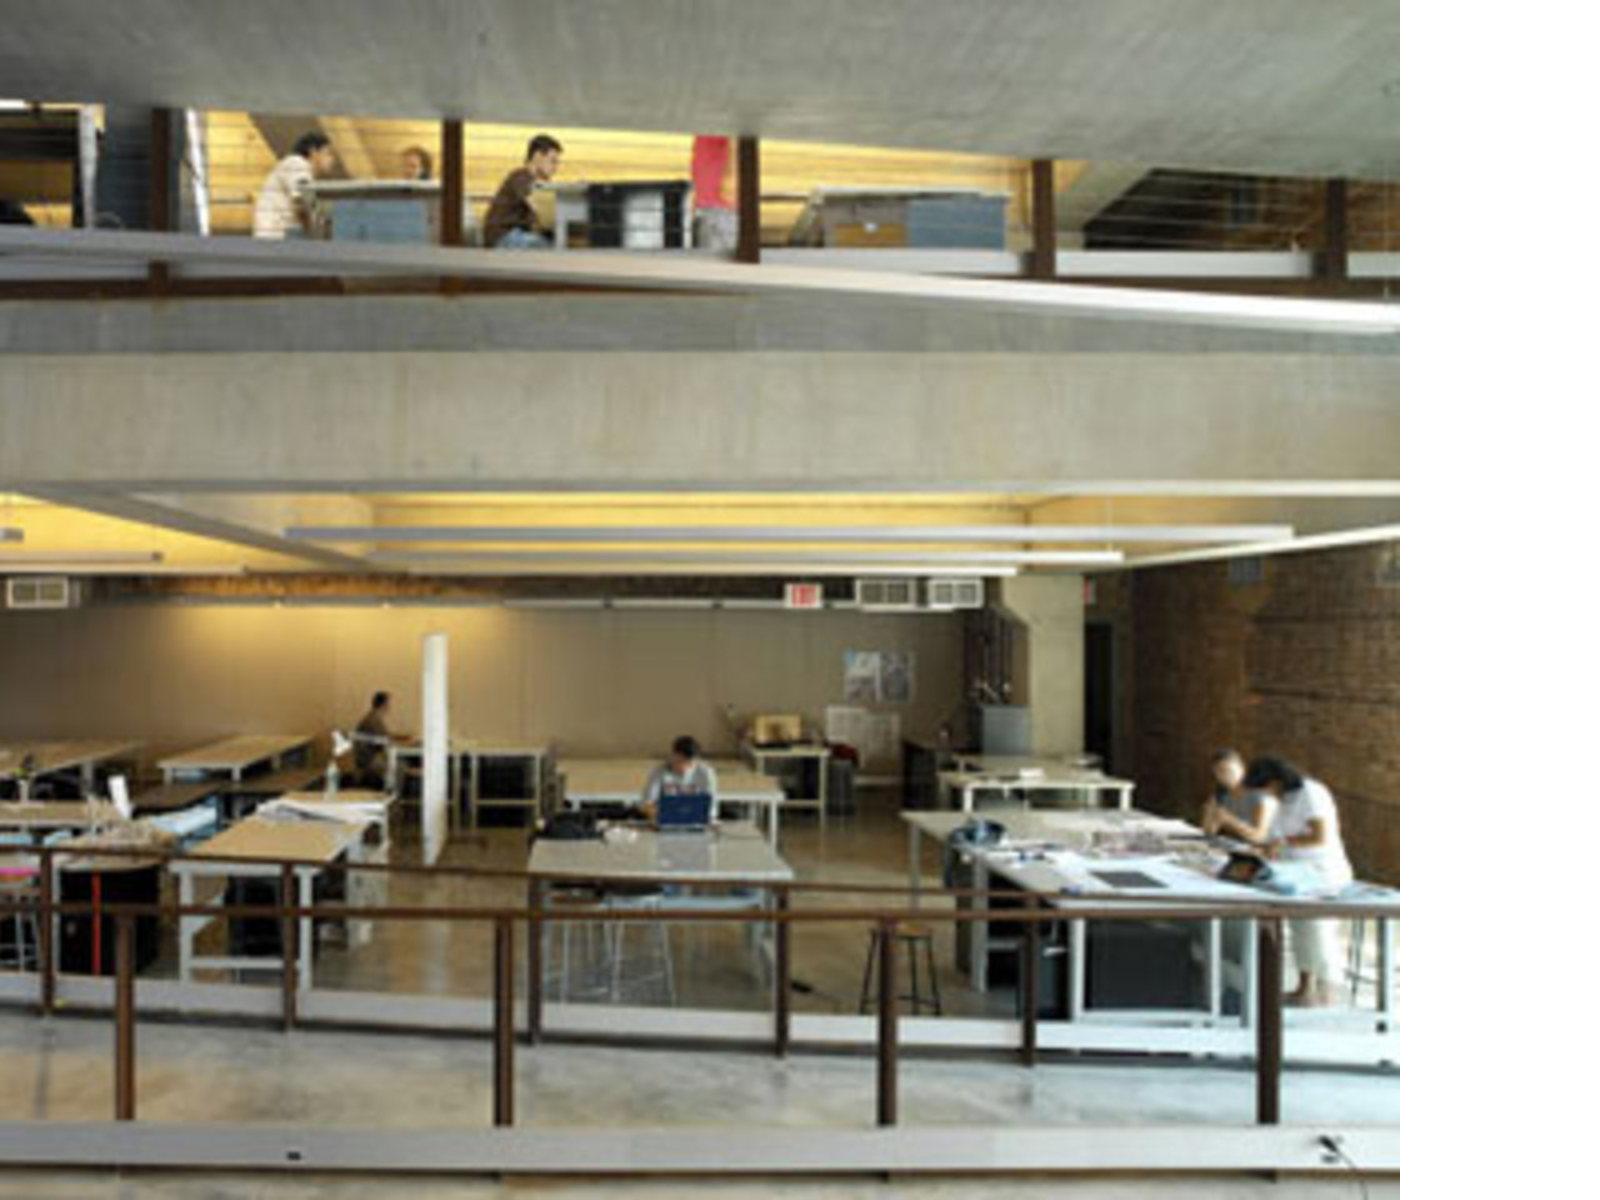 higgins hall pratt institute steven holl new york 2005 - Pratt Institute Interior Design